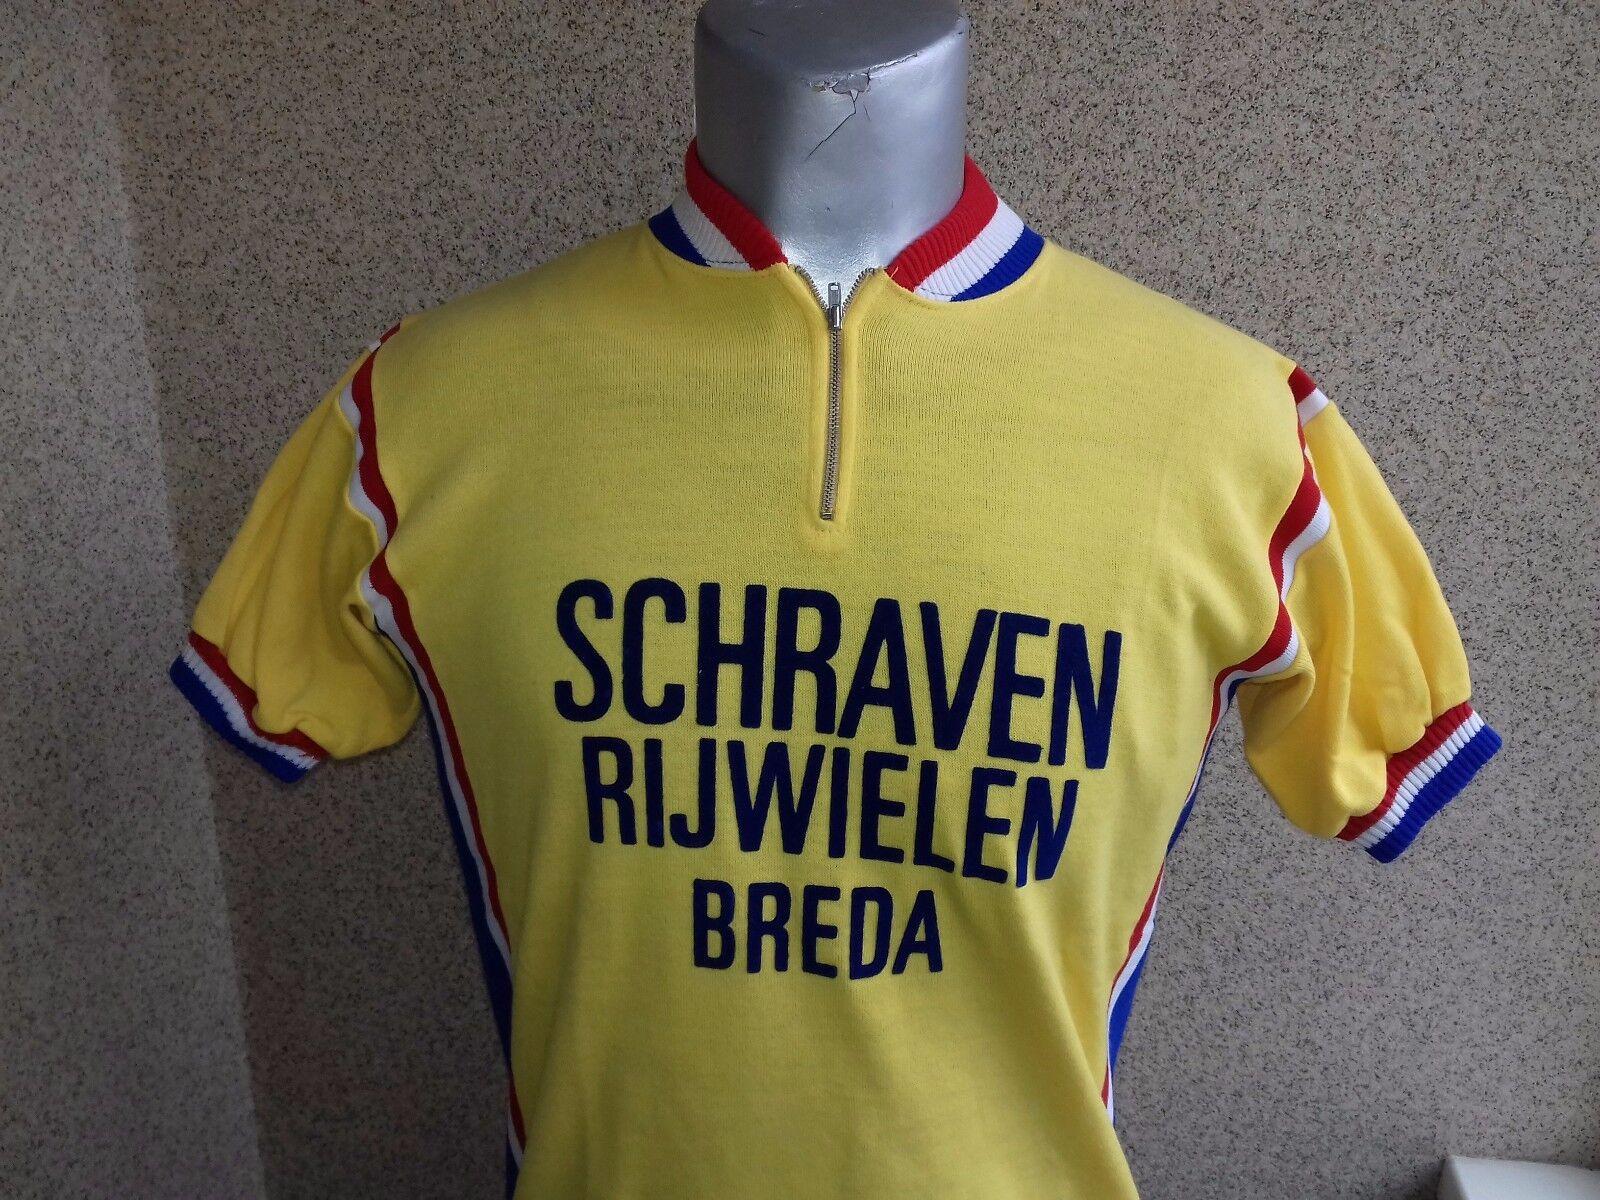 CYCLING CAMPITELLO RARE VINTAGE SHIRT BrossoA JESRSEY RARE CAMPITELLO CAMISETA 1980 a9abcf